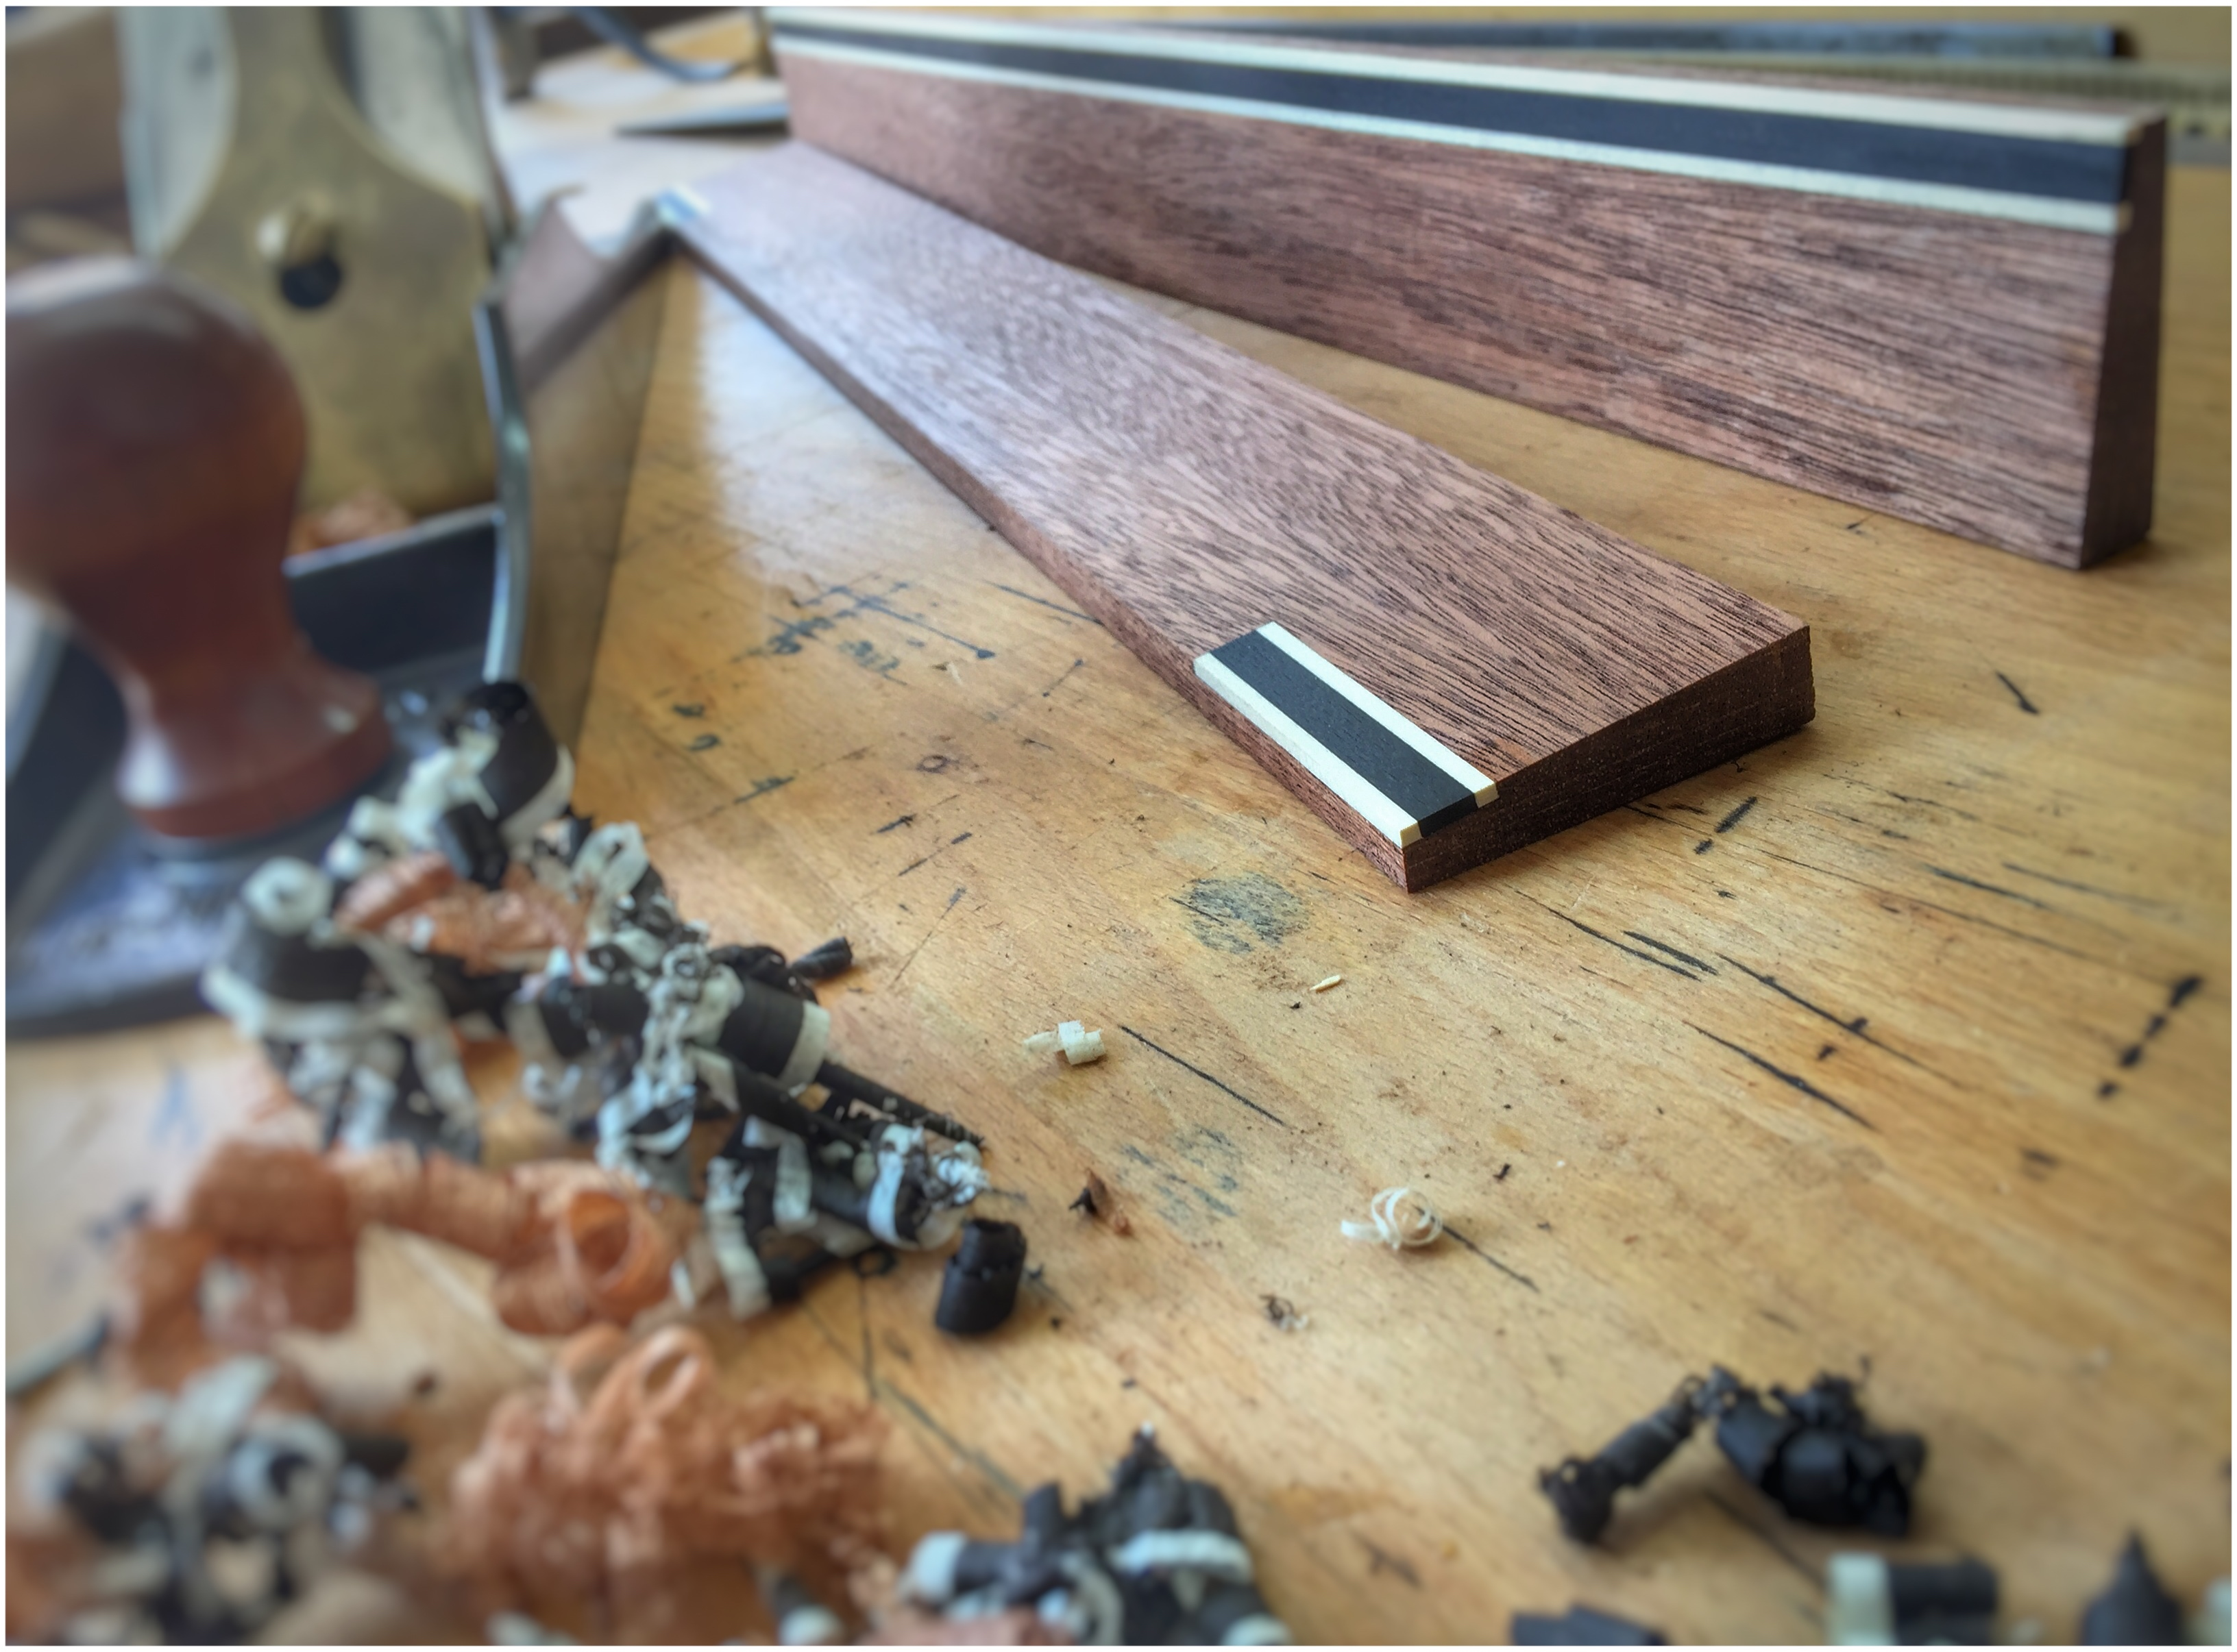 Workshop Appliances – Winding Sticks